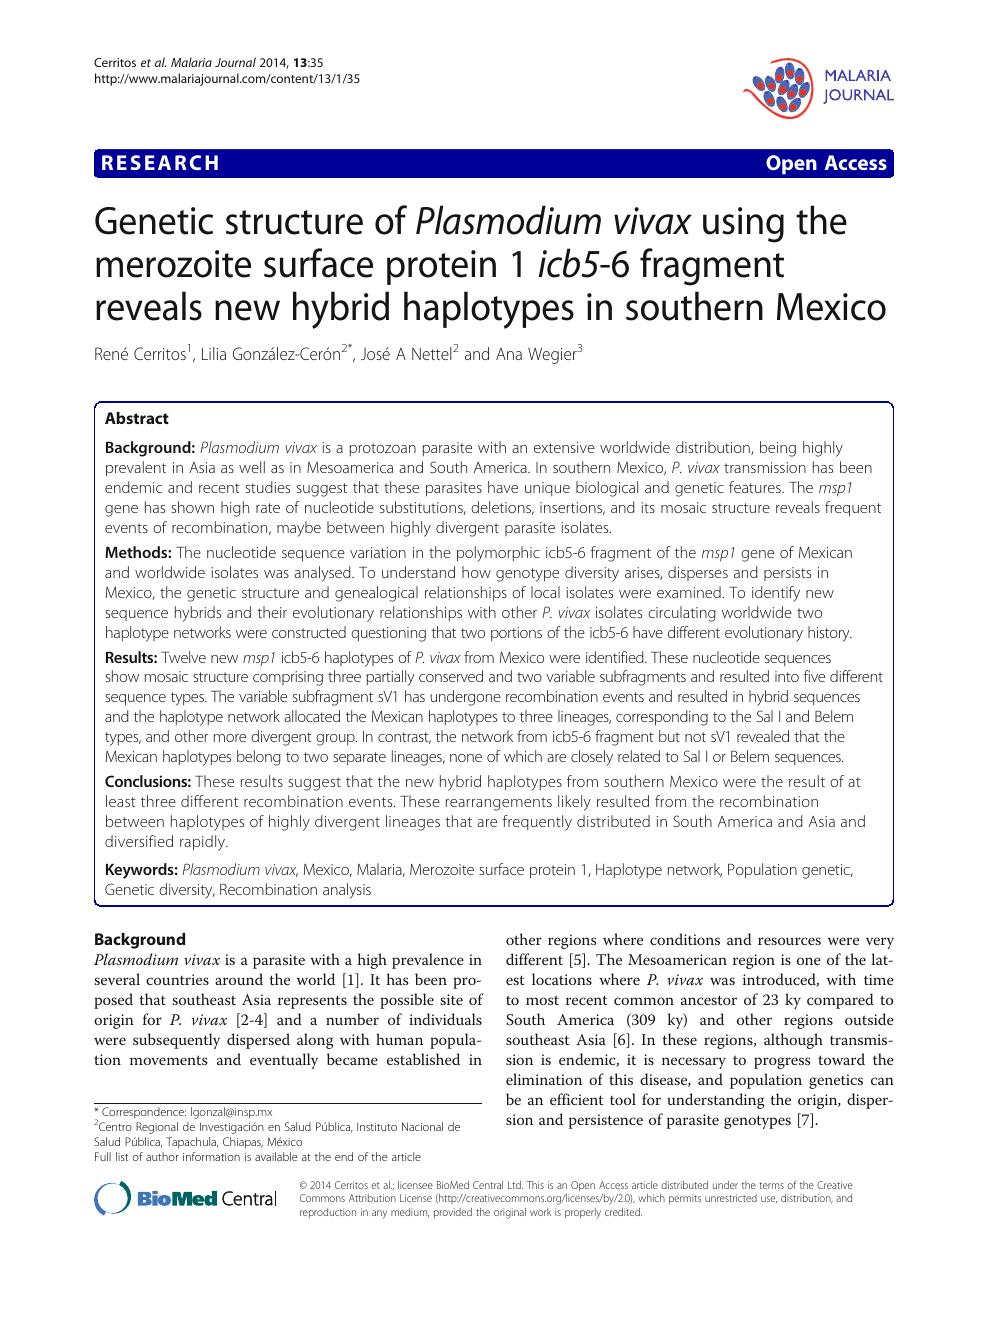 Genetic structure of Plasmodium vivax using the merozoite